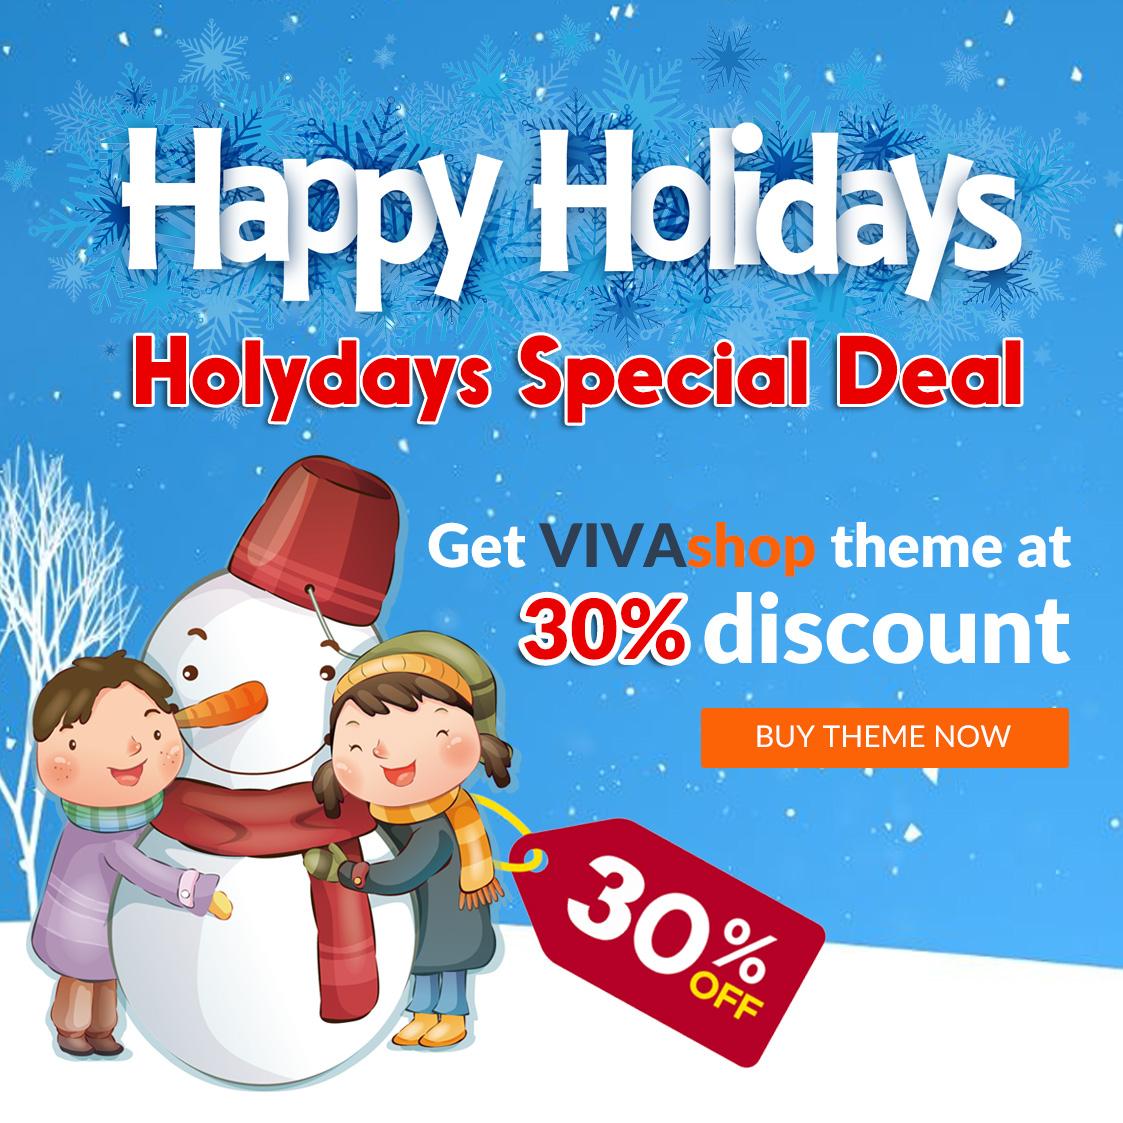 VIVAshop-Christmas-discount-2019-MP.jpg